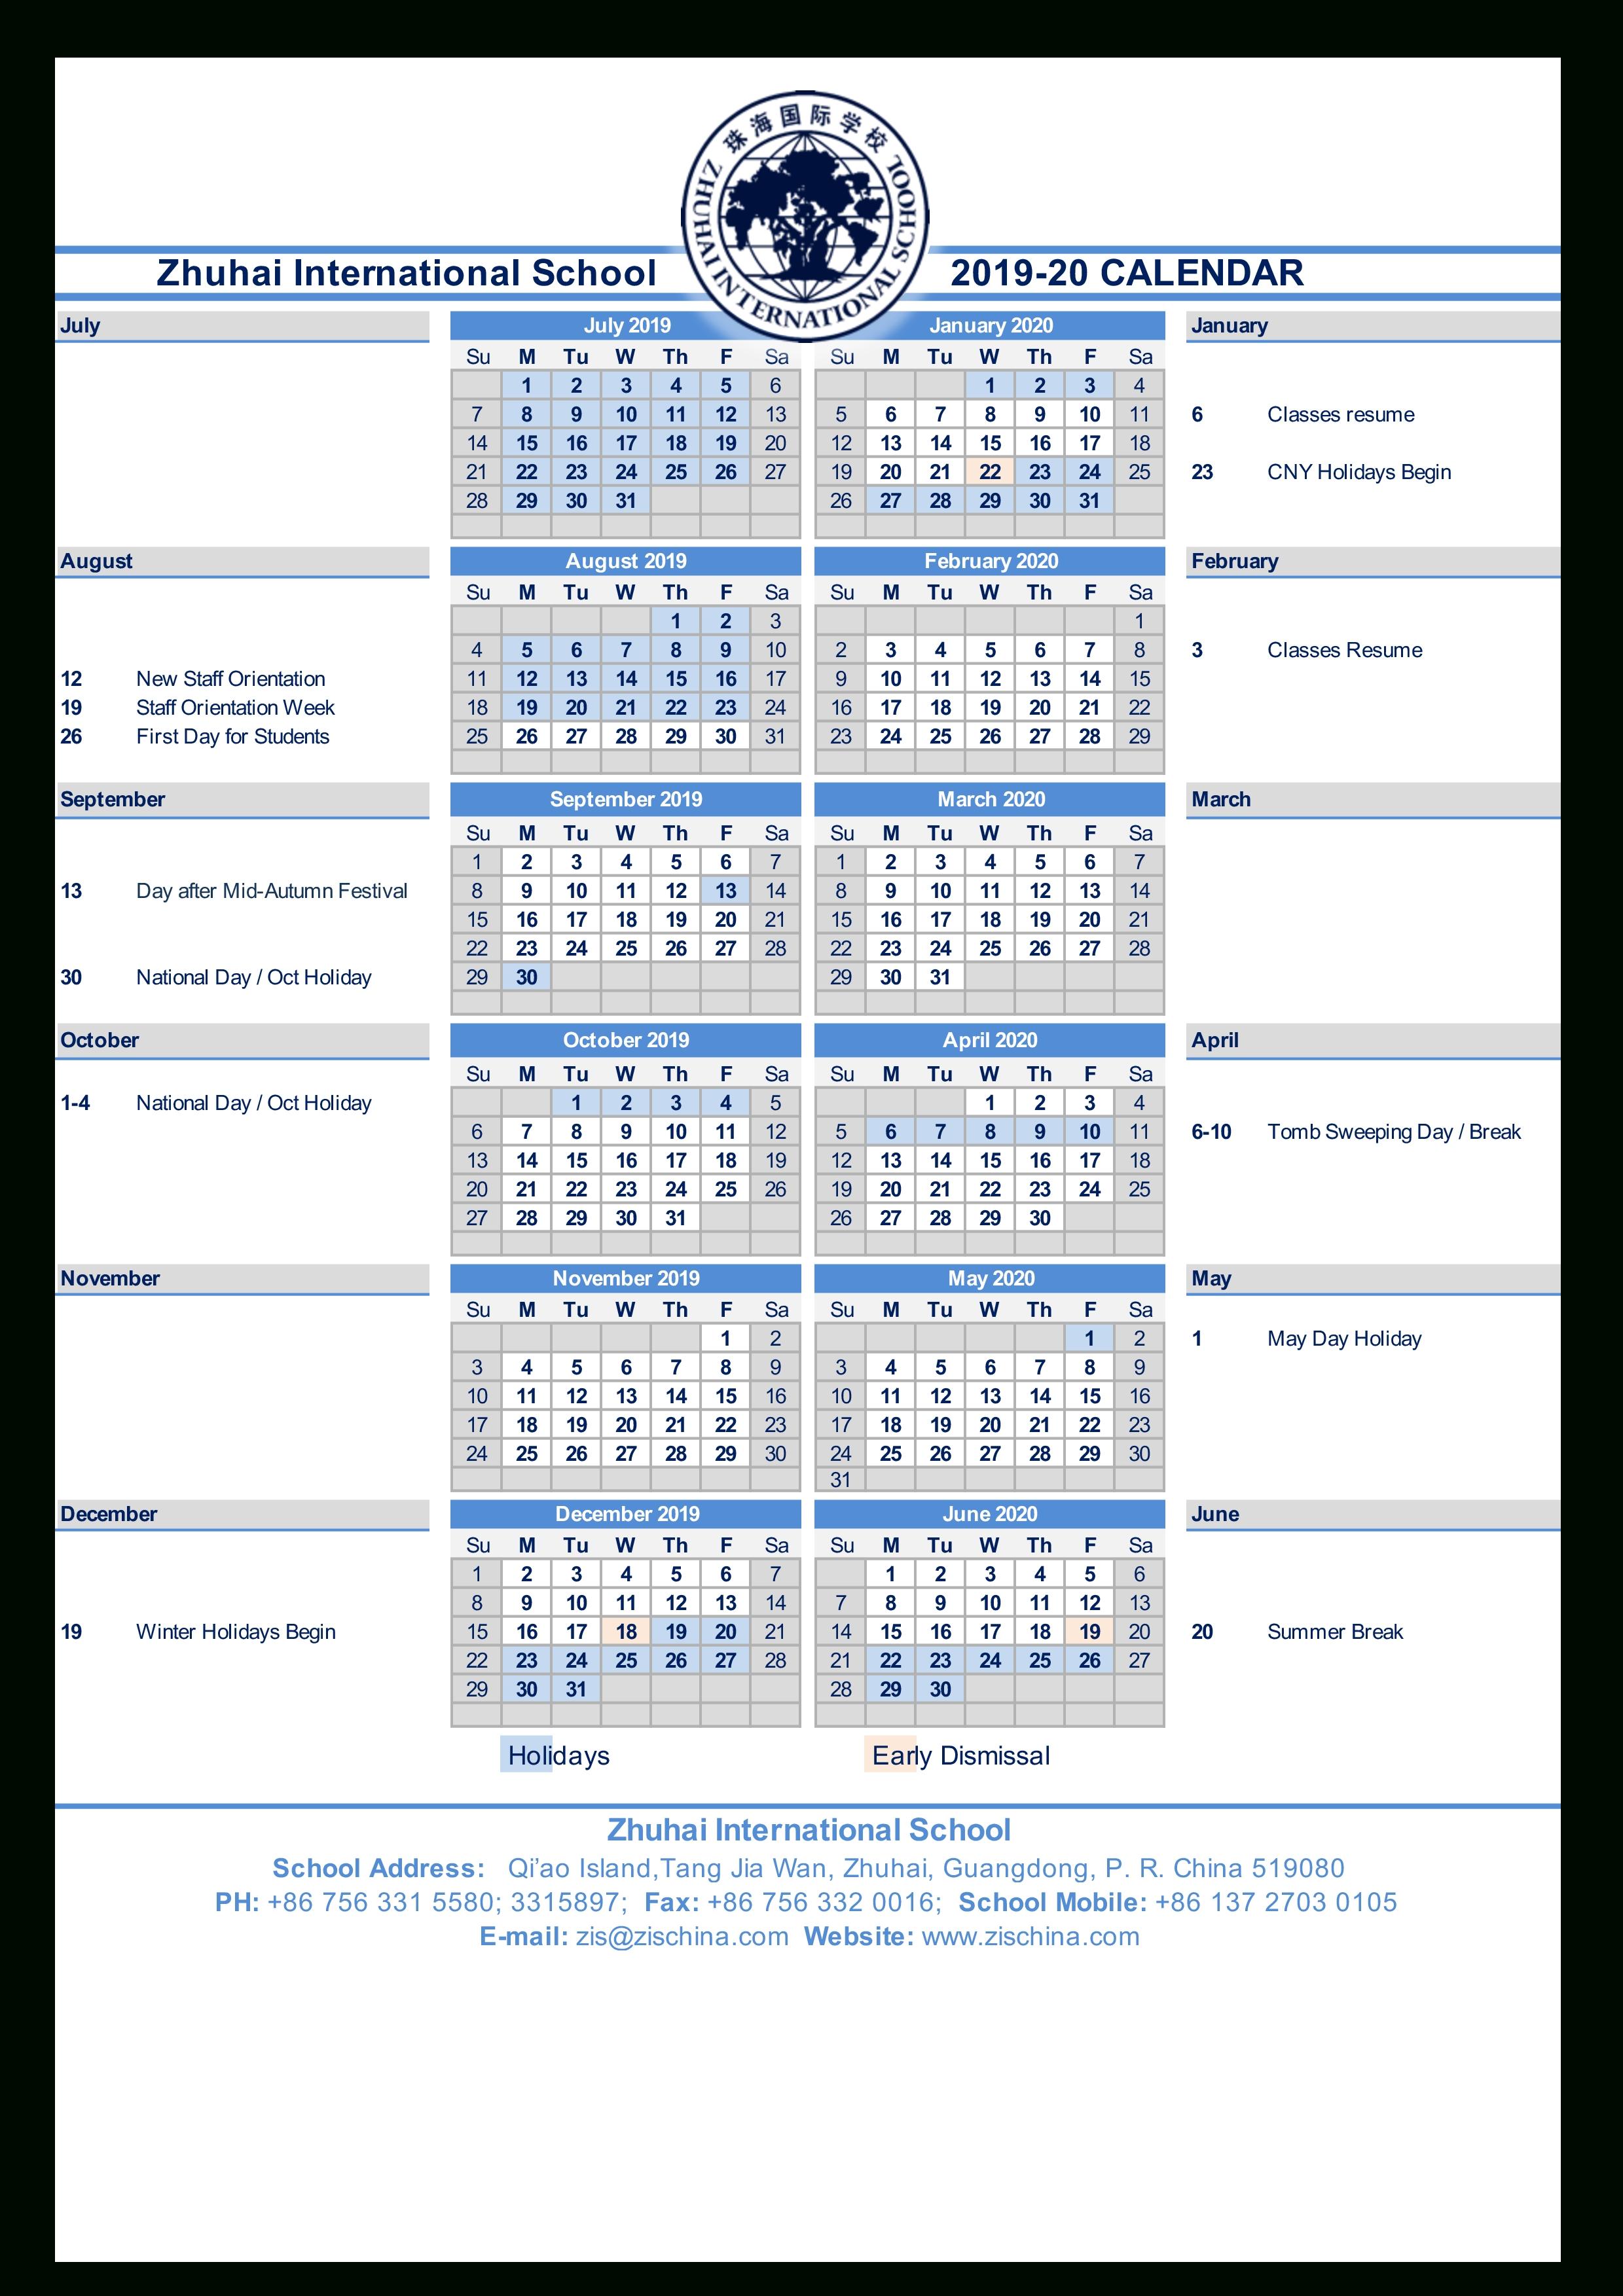 Calendars | Zhuhai International School Zis Calendar 2019